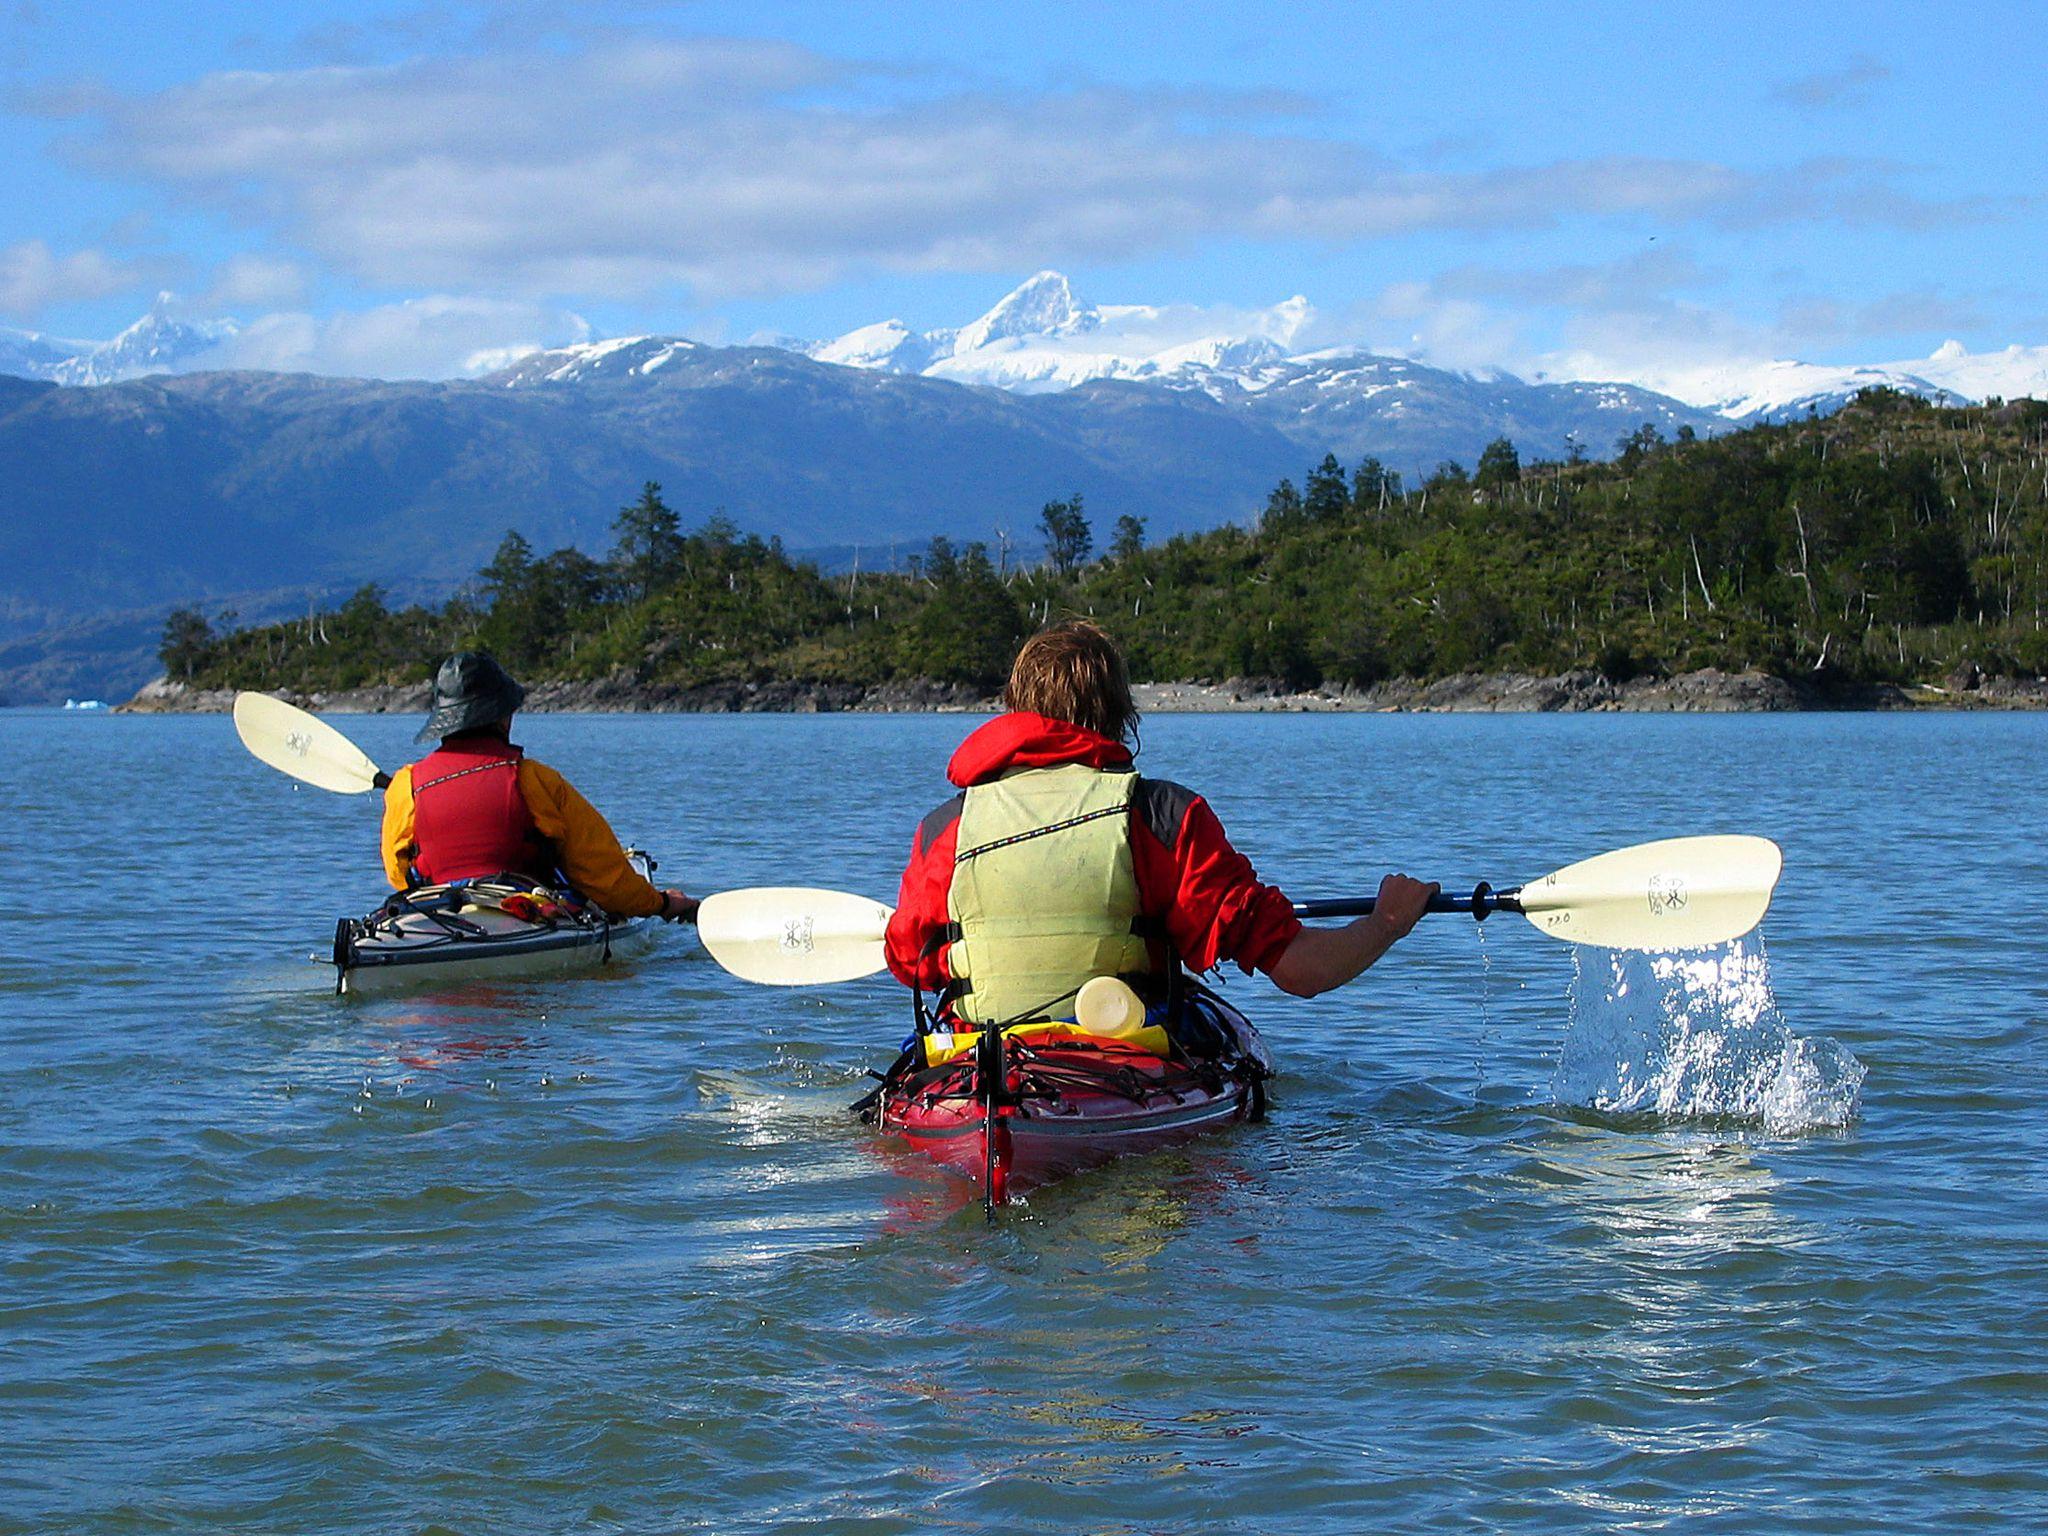 Gap Year Program - NOLS Fall Gap Semester in Patagonia  3